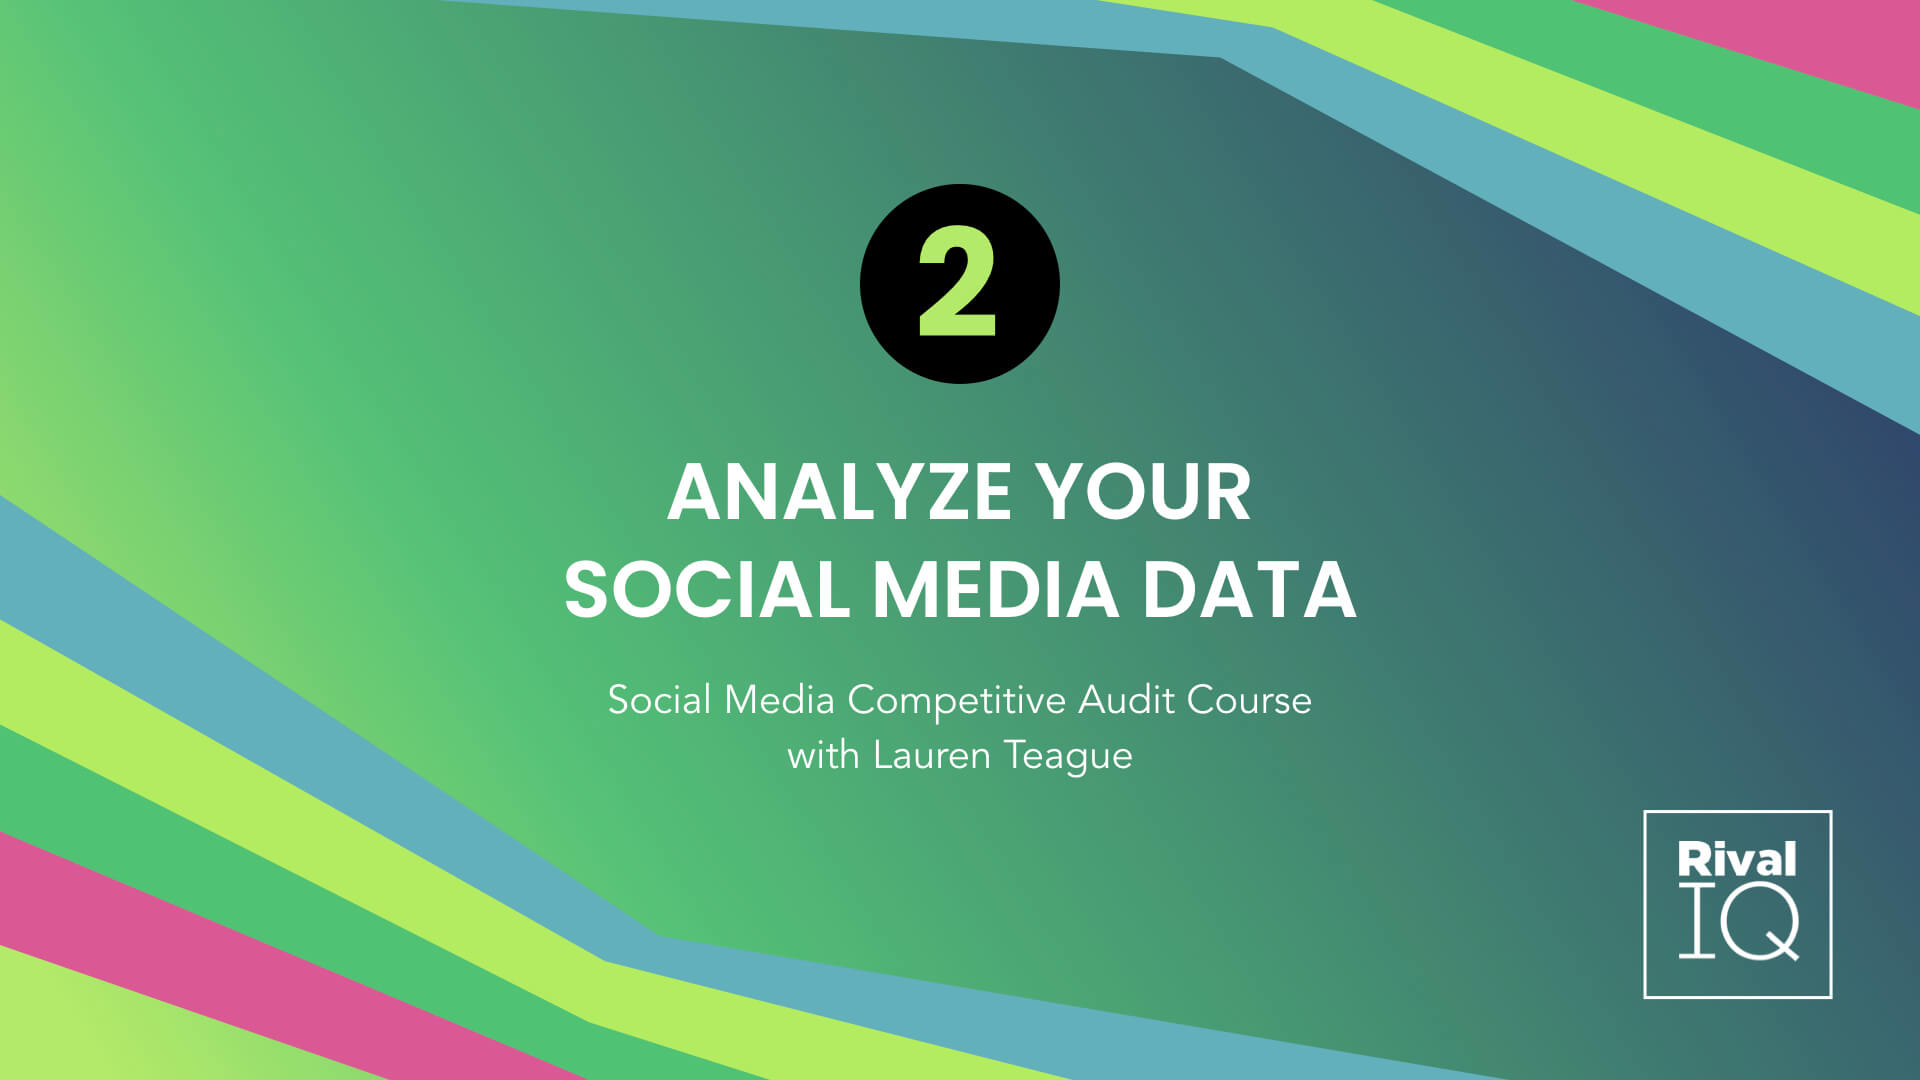 Lesson 2 Social Media Competitive Audit Course